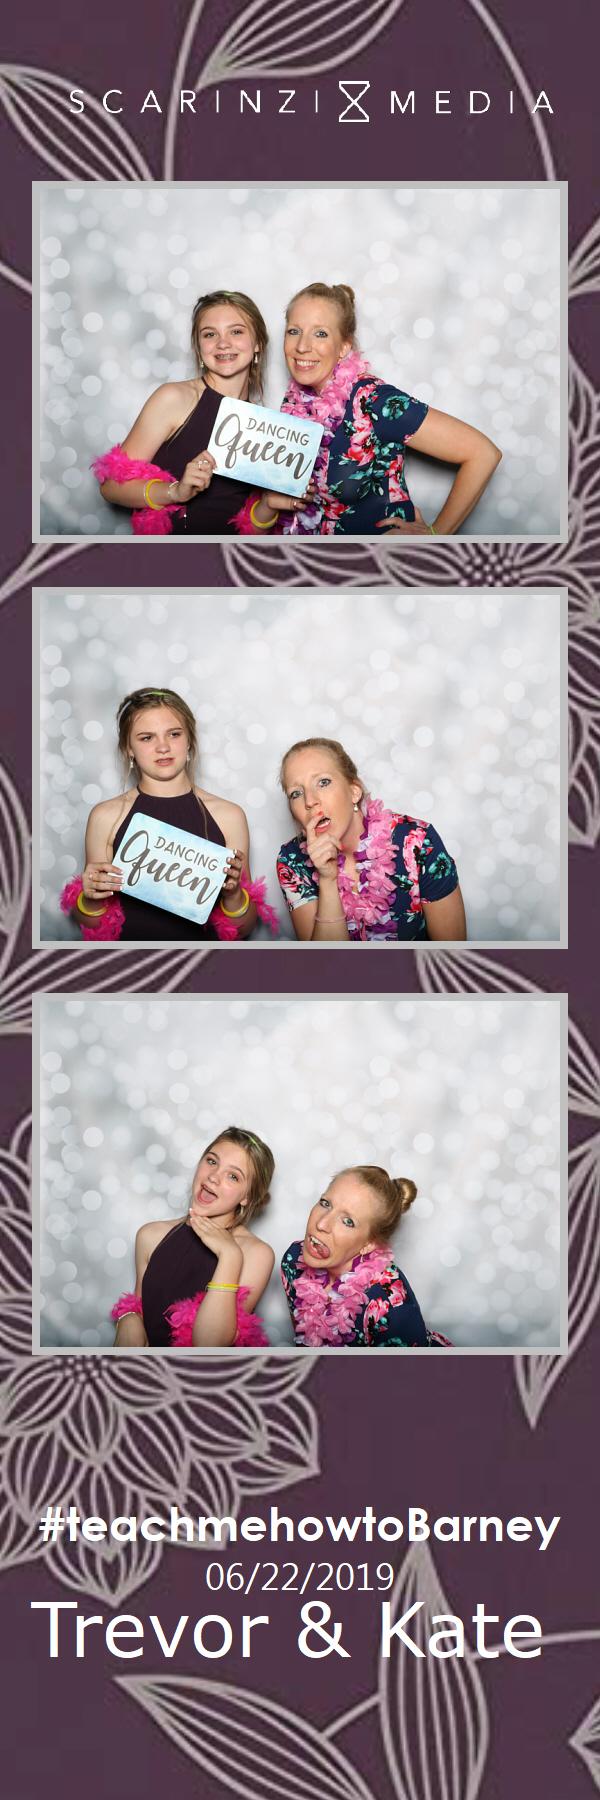 2019.06.22 - Barney Wedding PHOTOBOOTH62.jpg